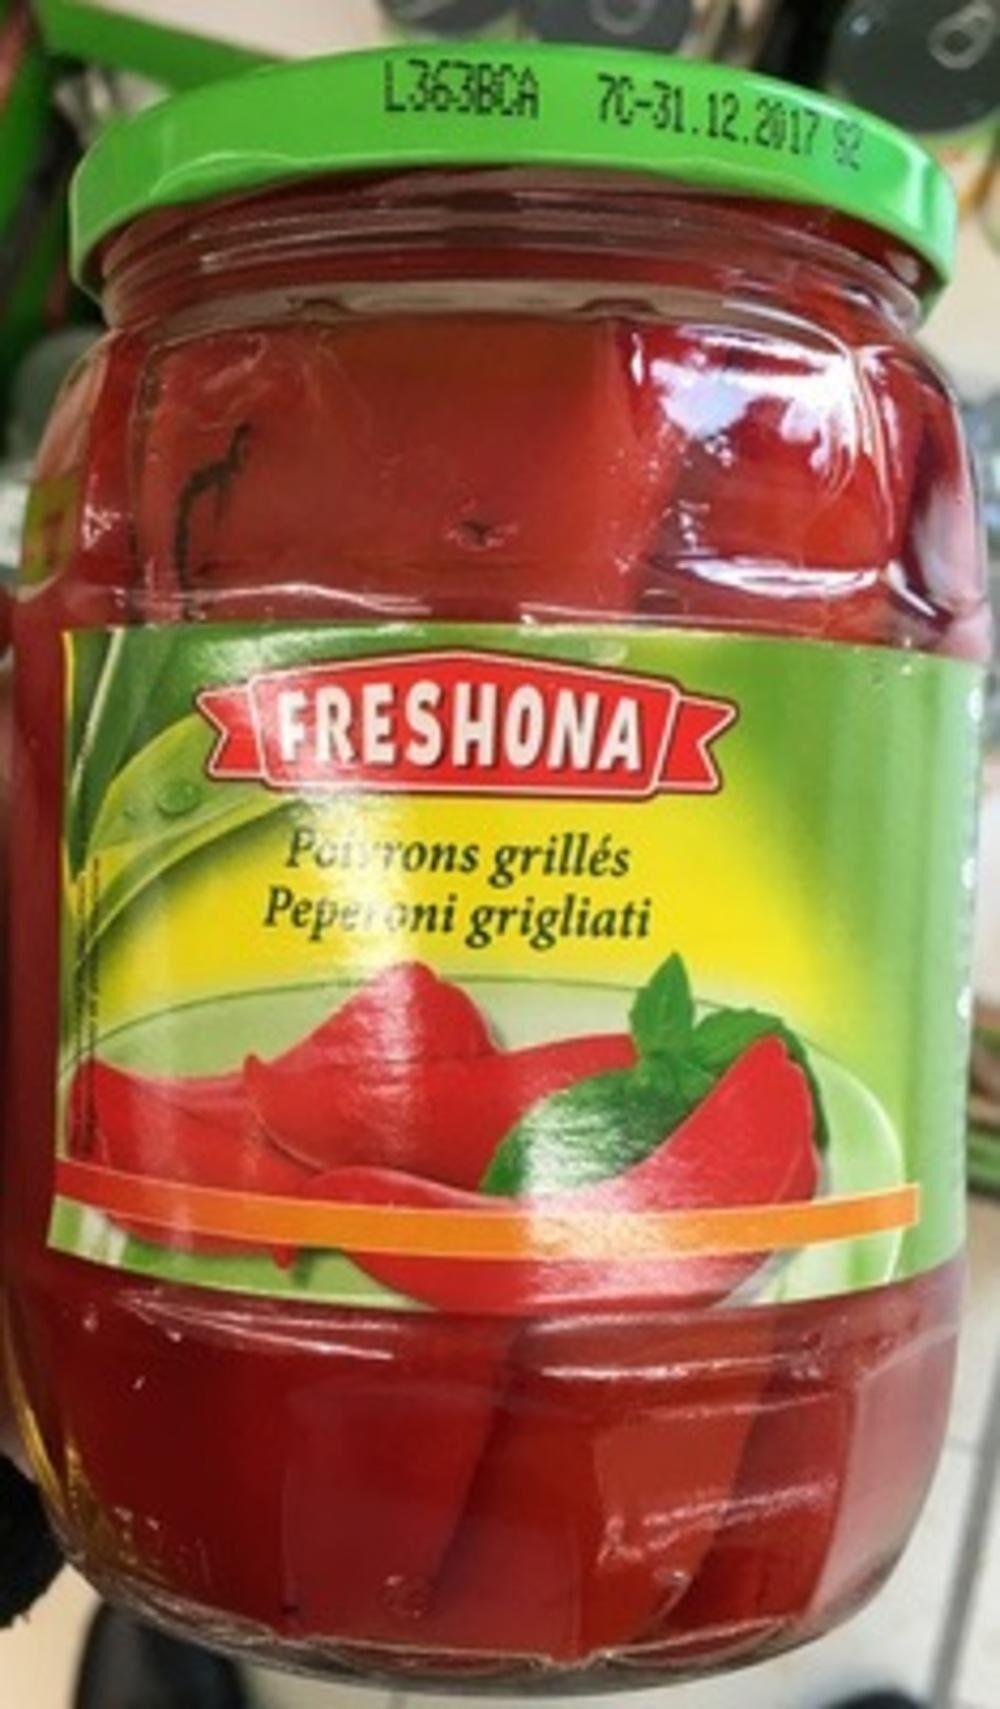 Poivrons grillés - Produkt - fr